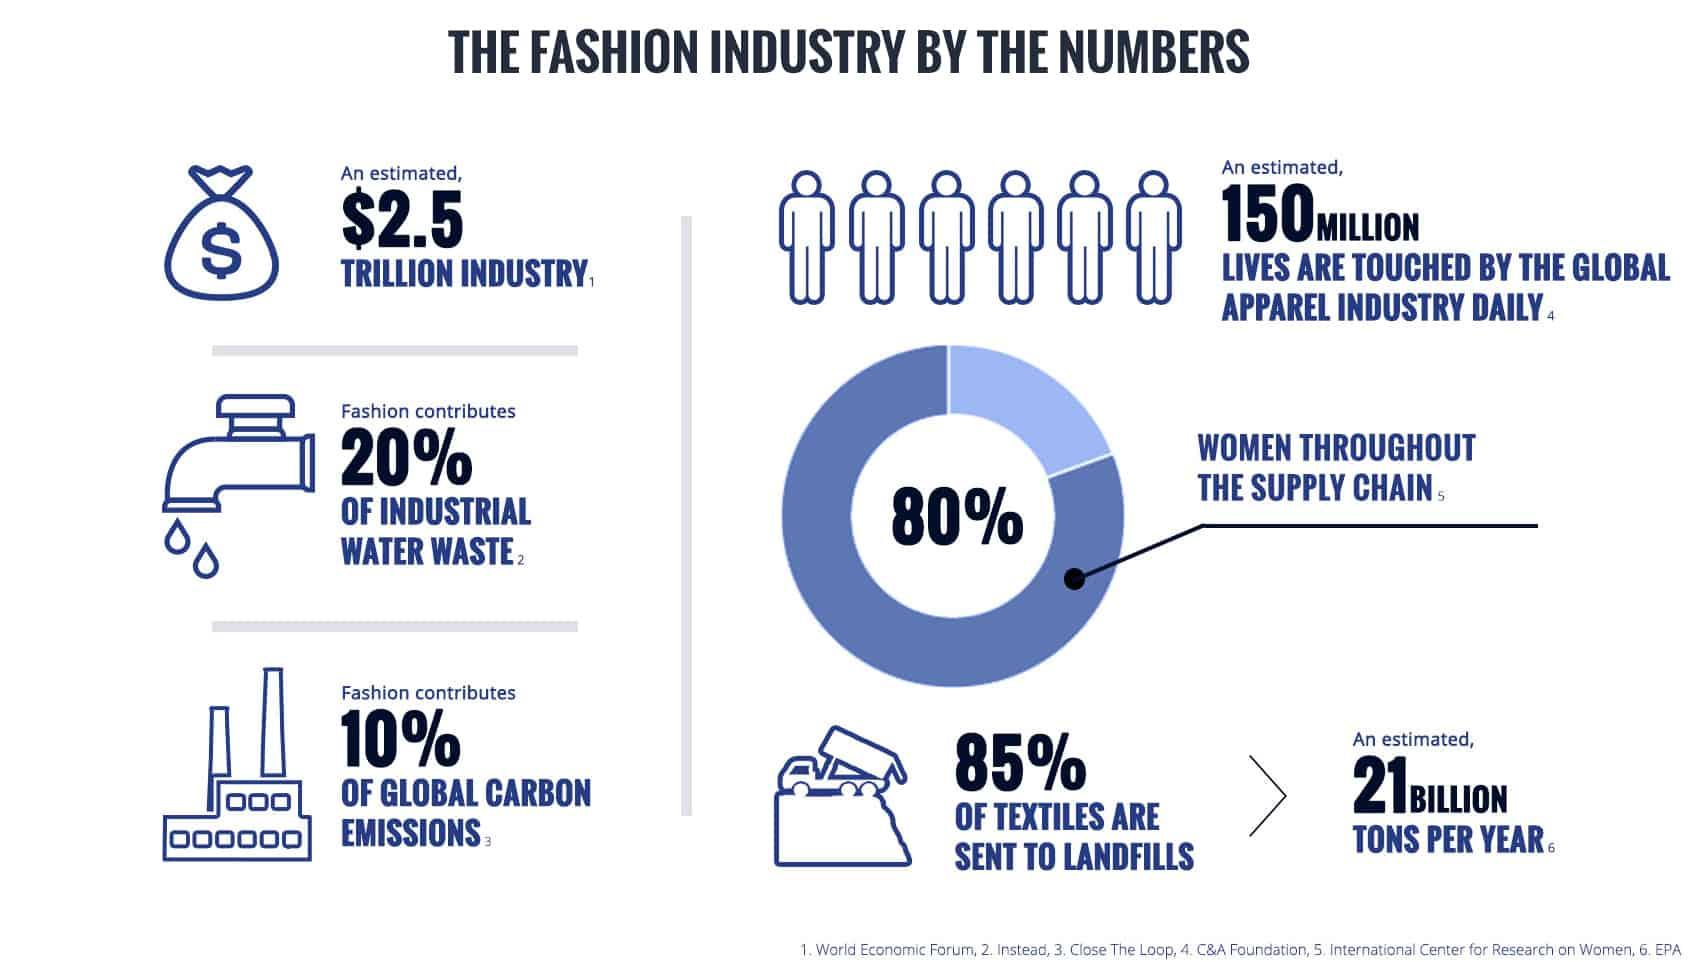 Image per the Fair Fashion Center